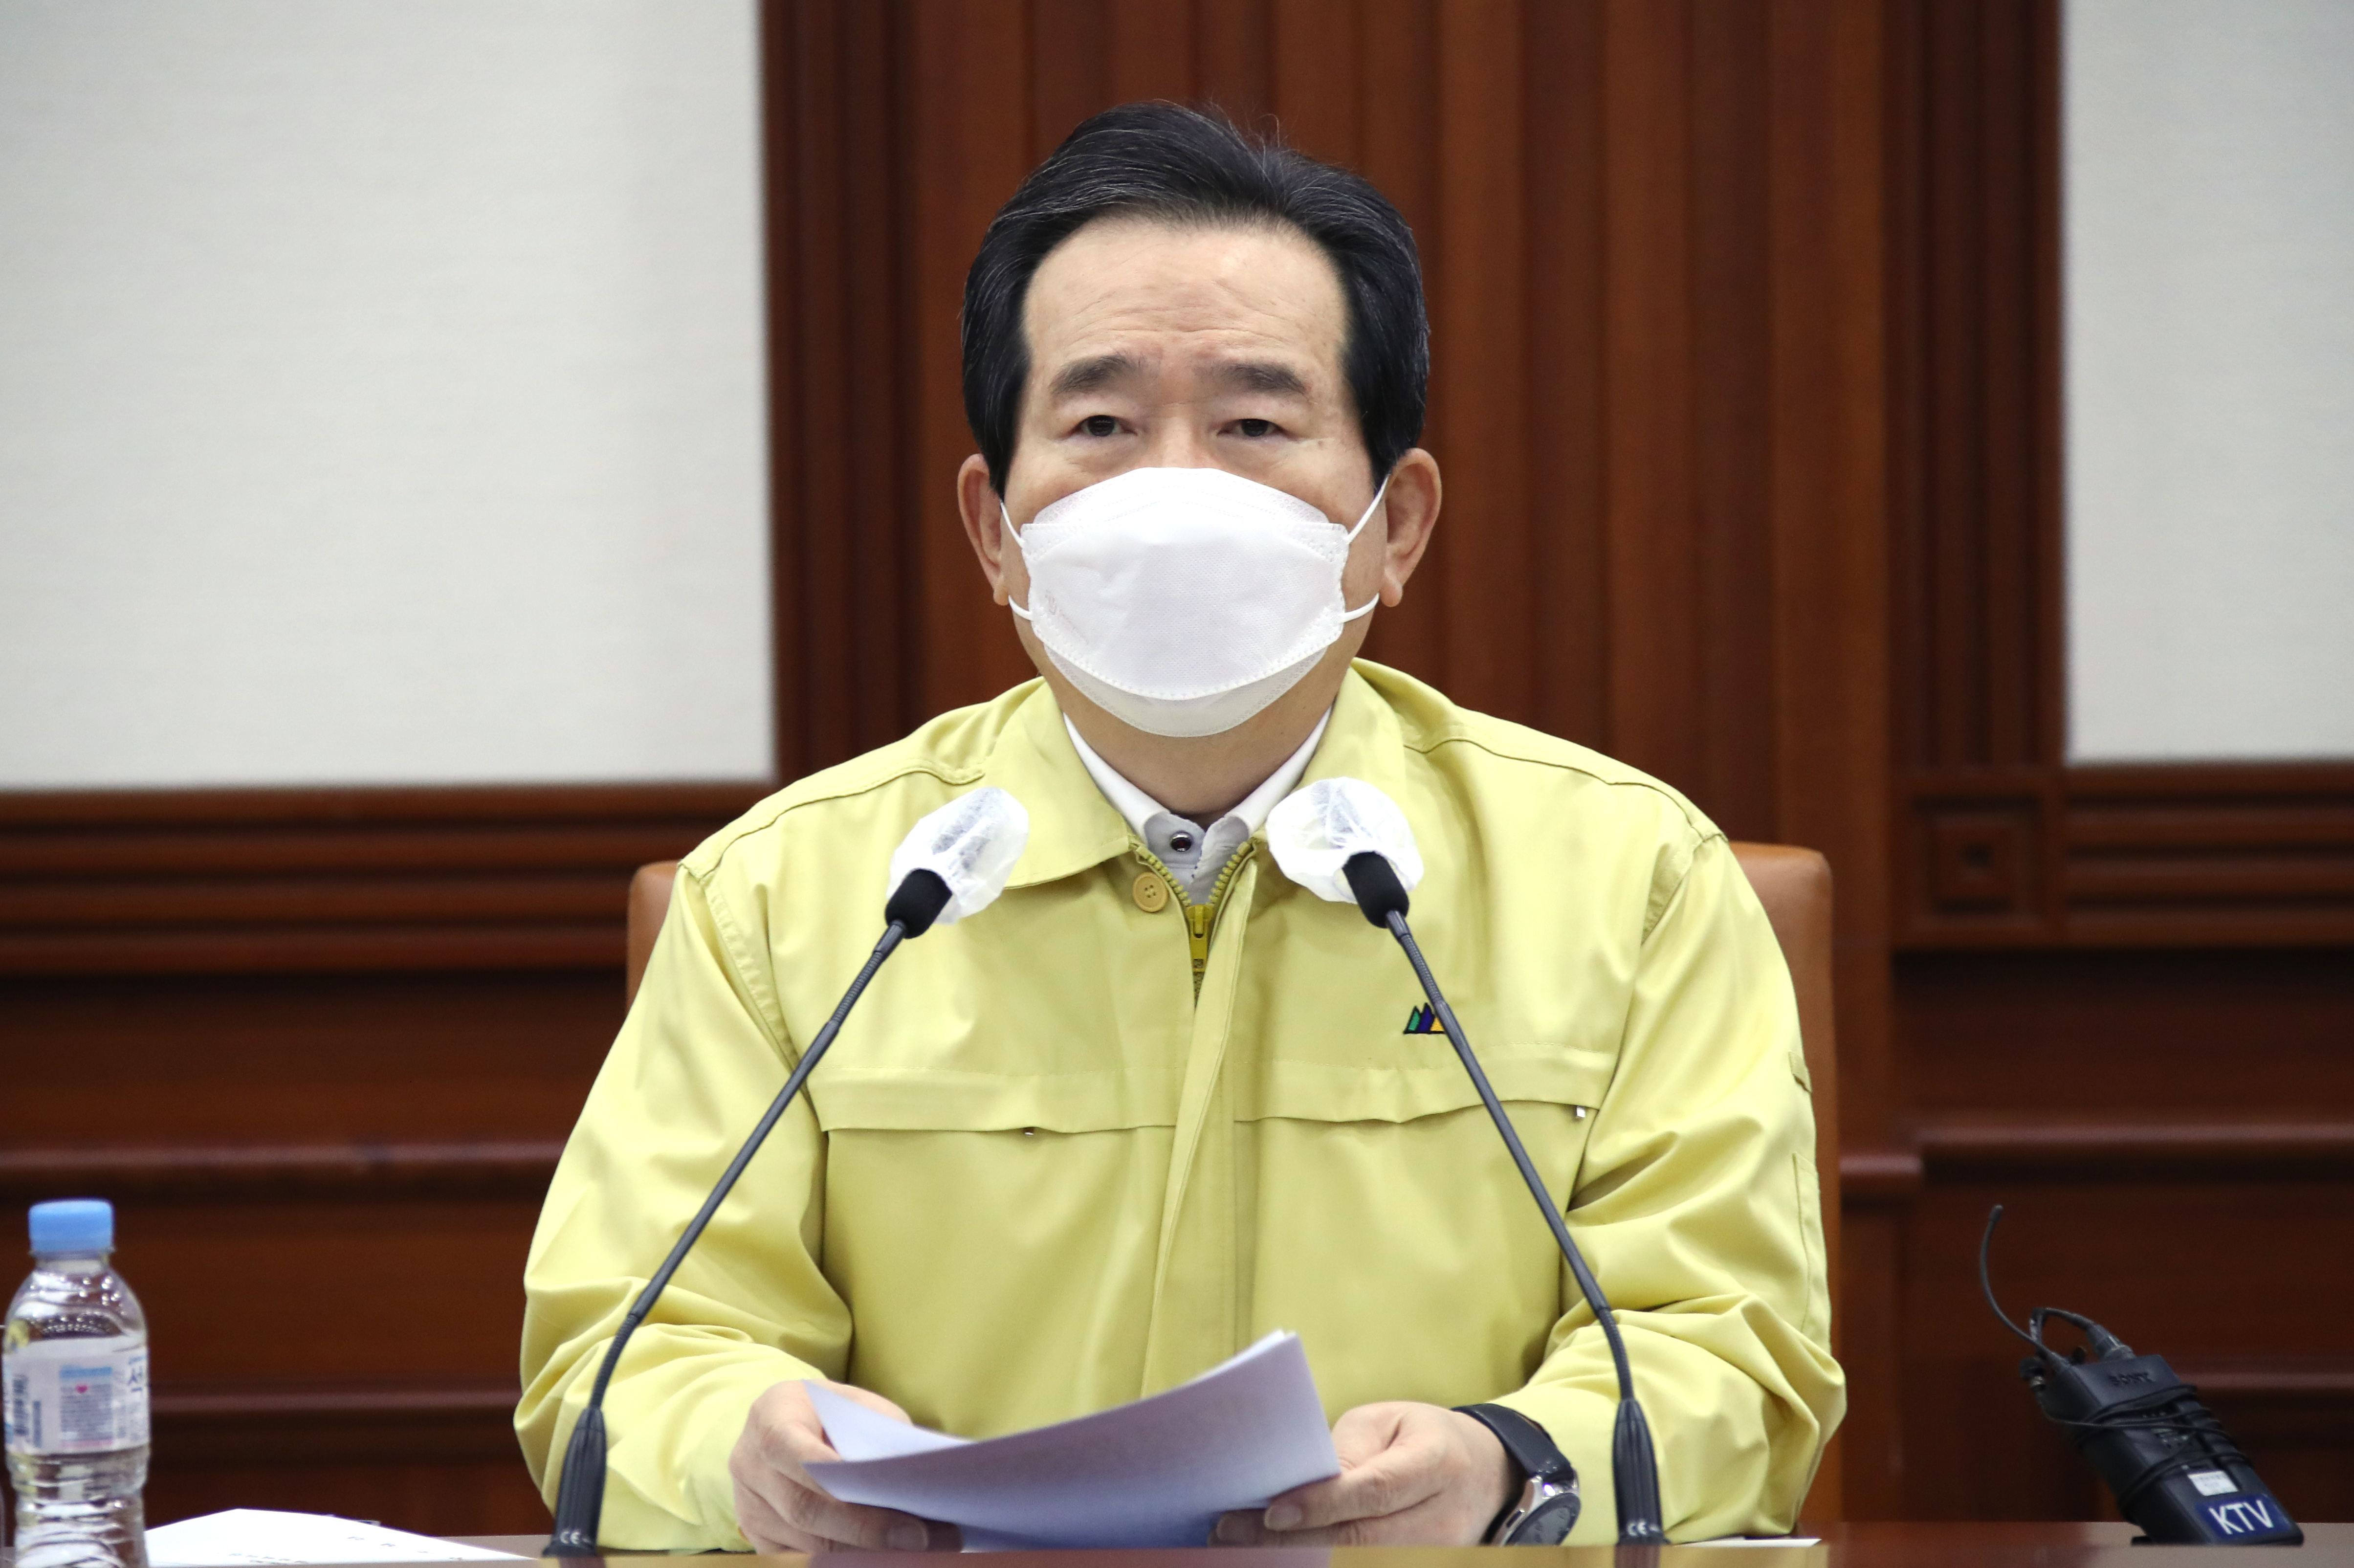 Prime Minister Chung Sye-kyun